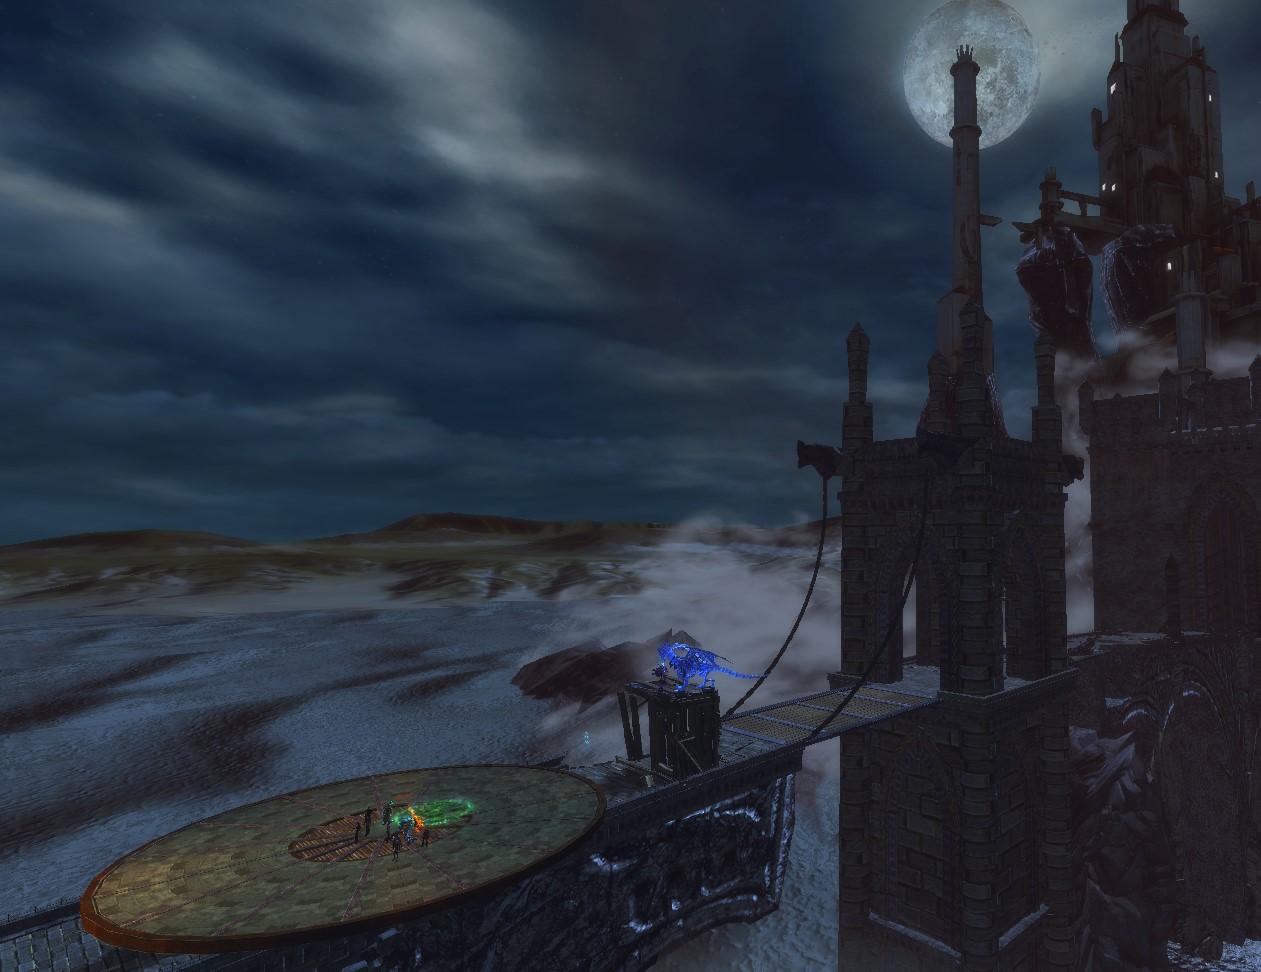 01 Battle of the Bridge at Night